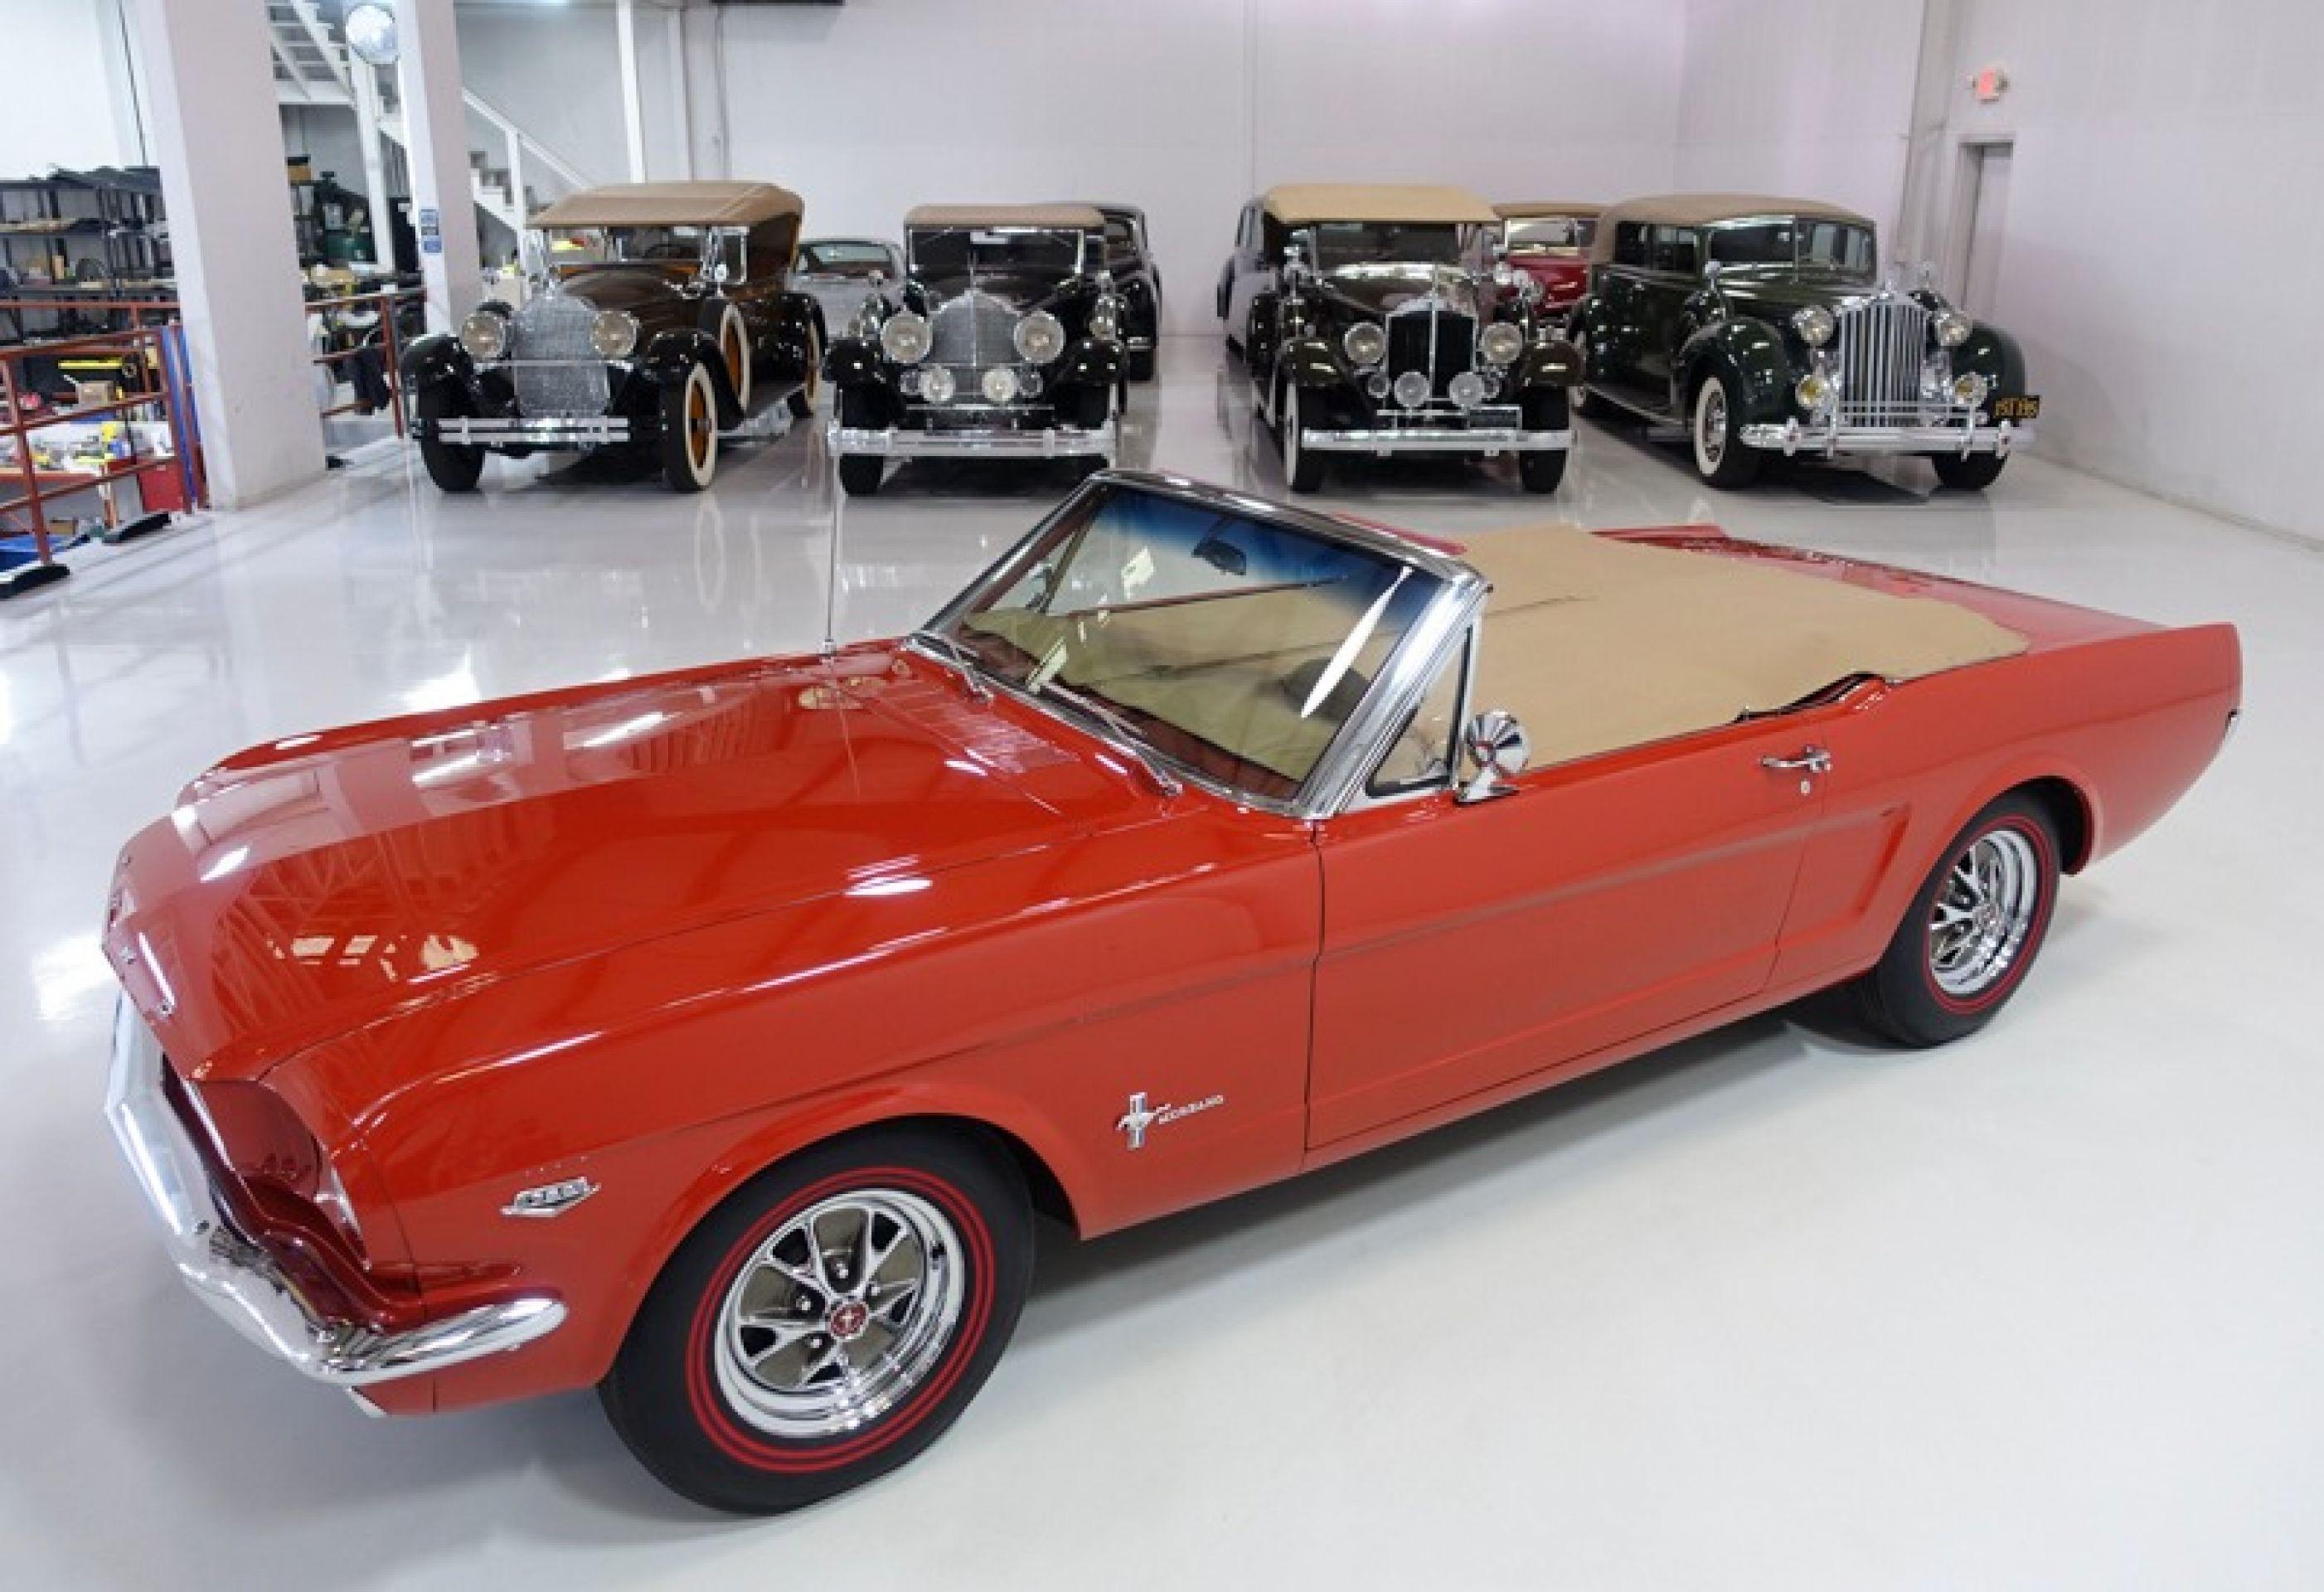 1965 Ford Mustang K-code Convertible